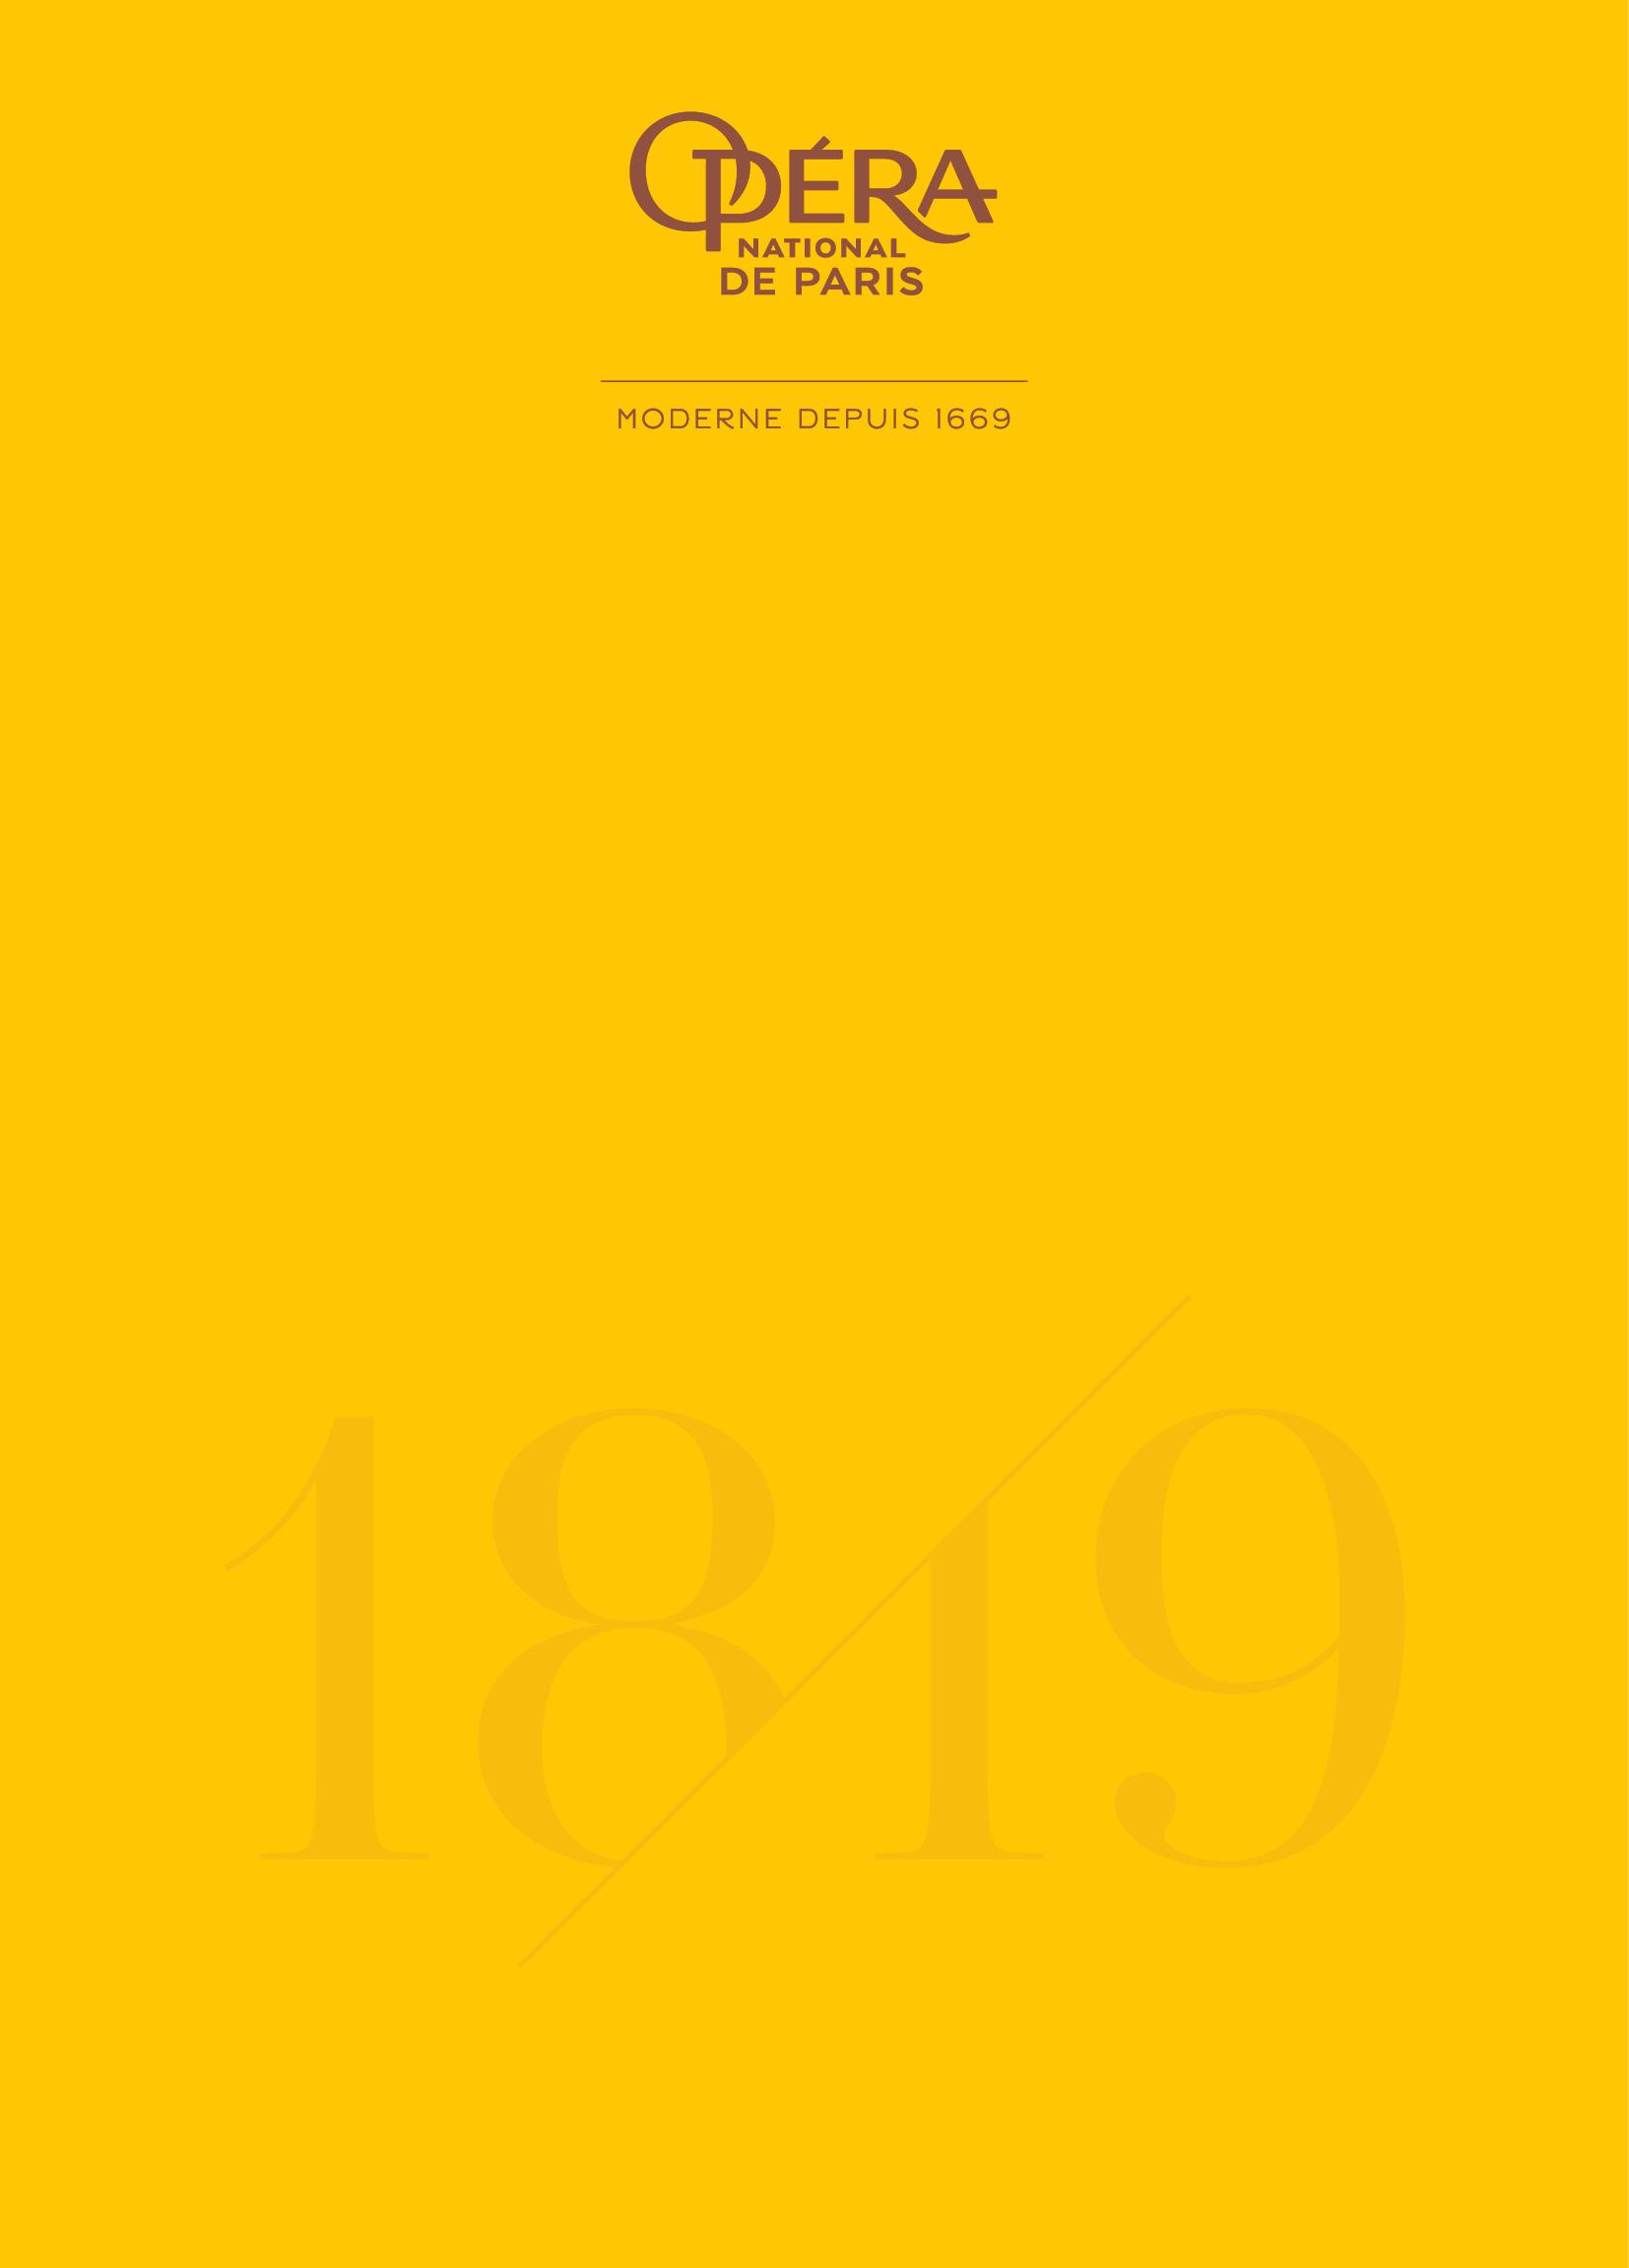 Opéra national de Paris - Brochure de saison. 2018/2019, Opéra national de Paris |